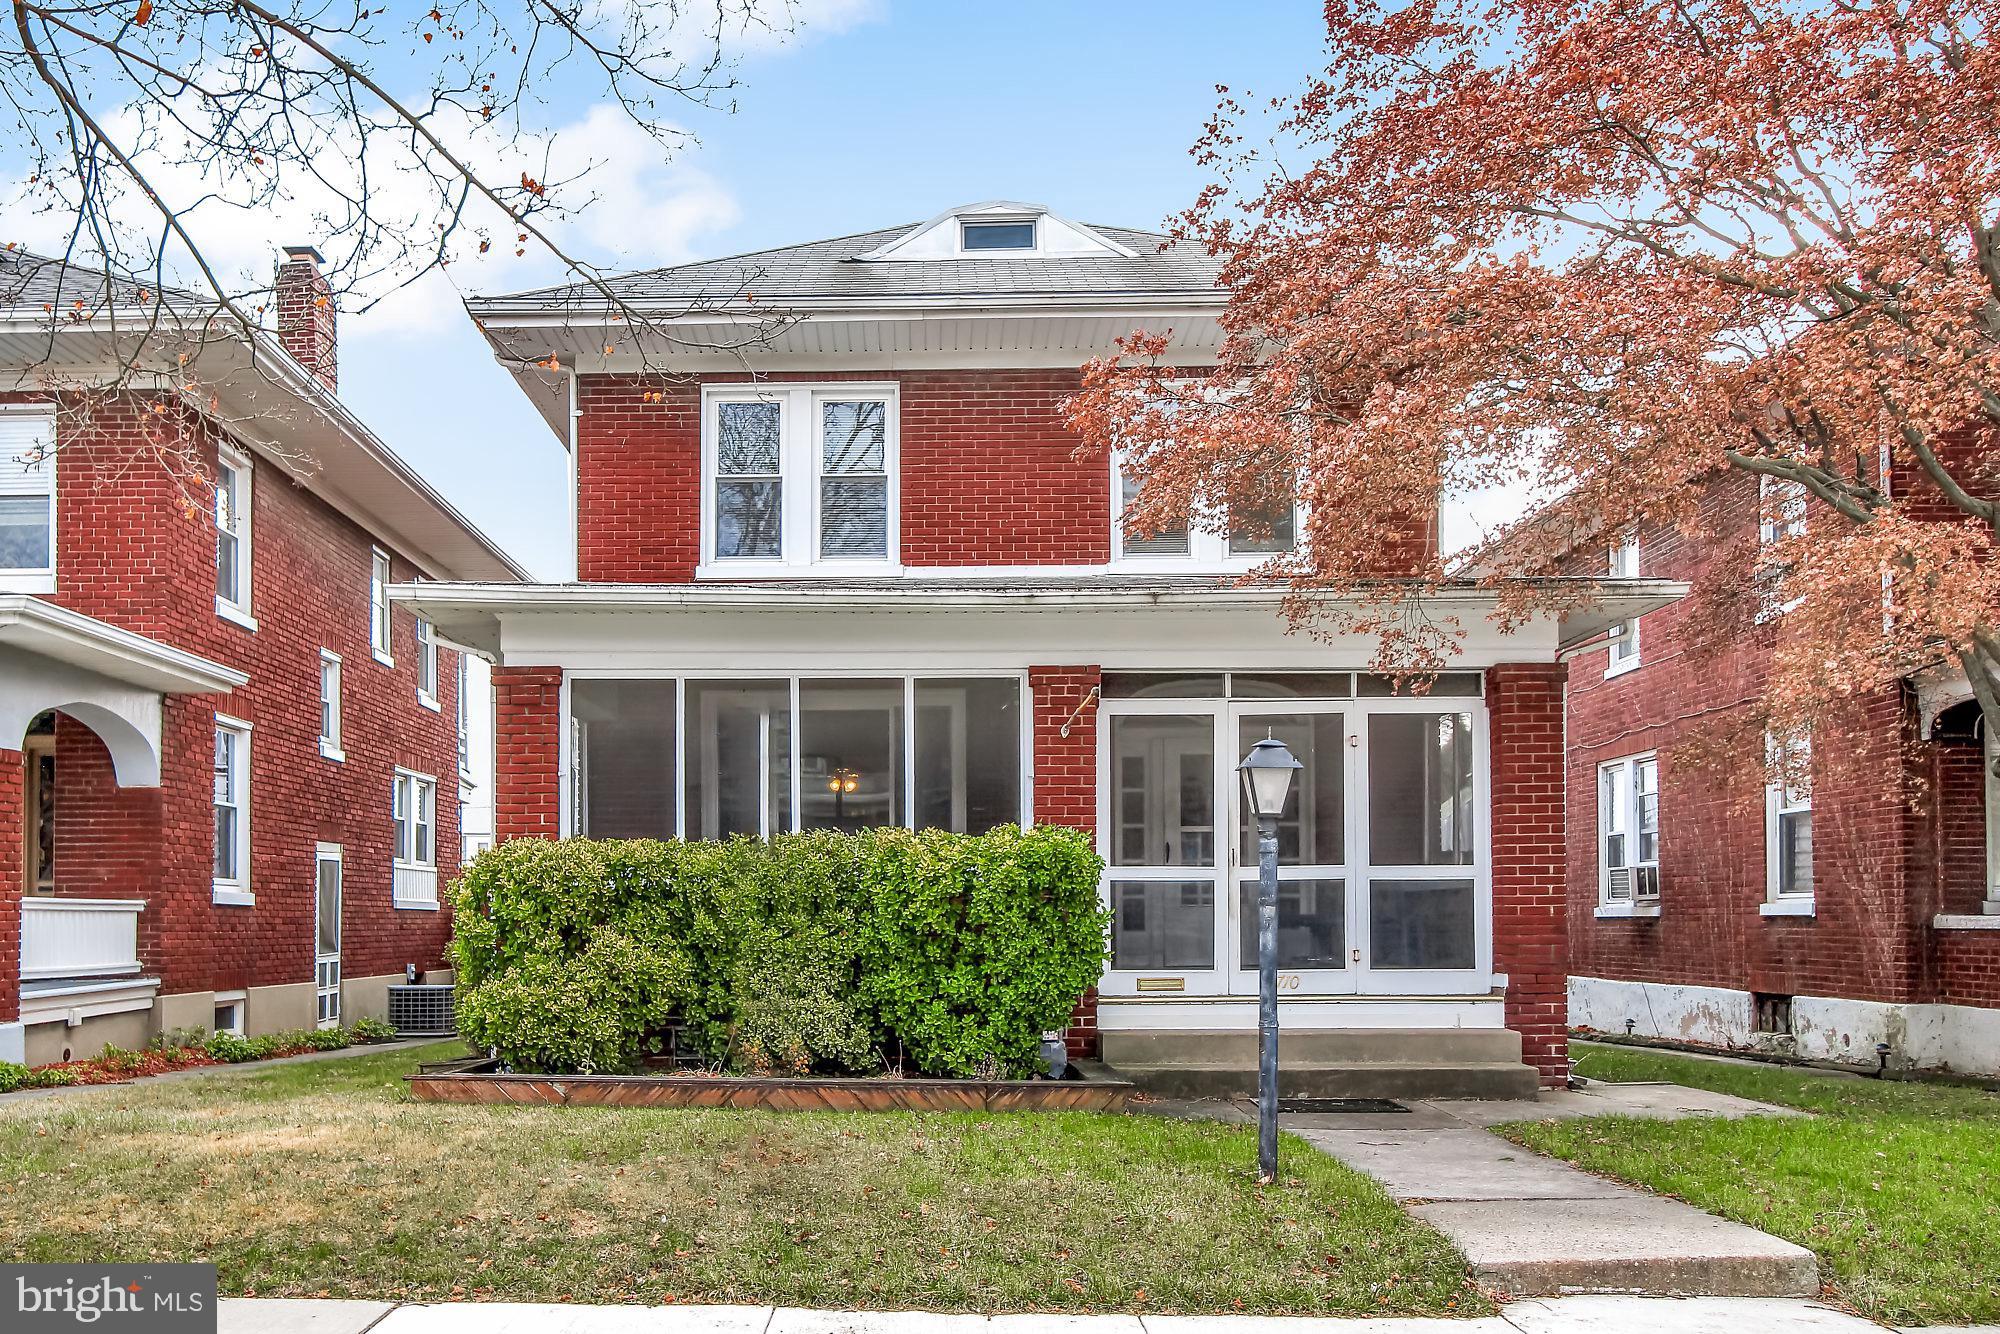 710 W MARYLAND Ave, York, PA, 17404